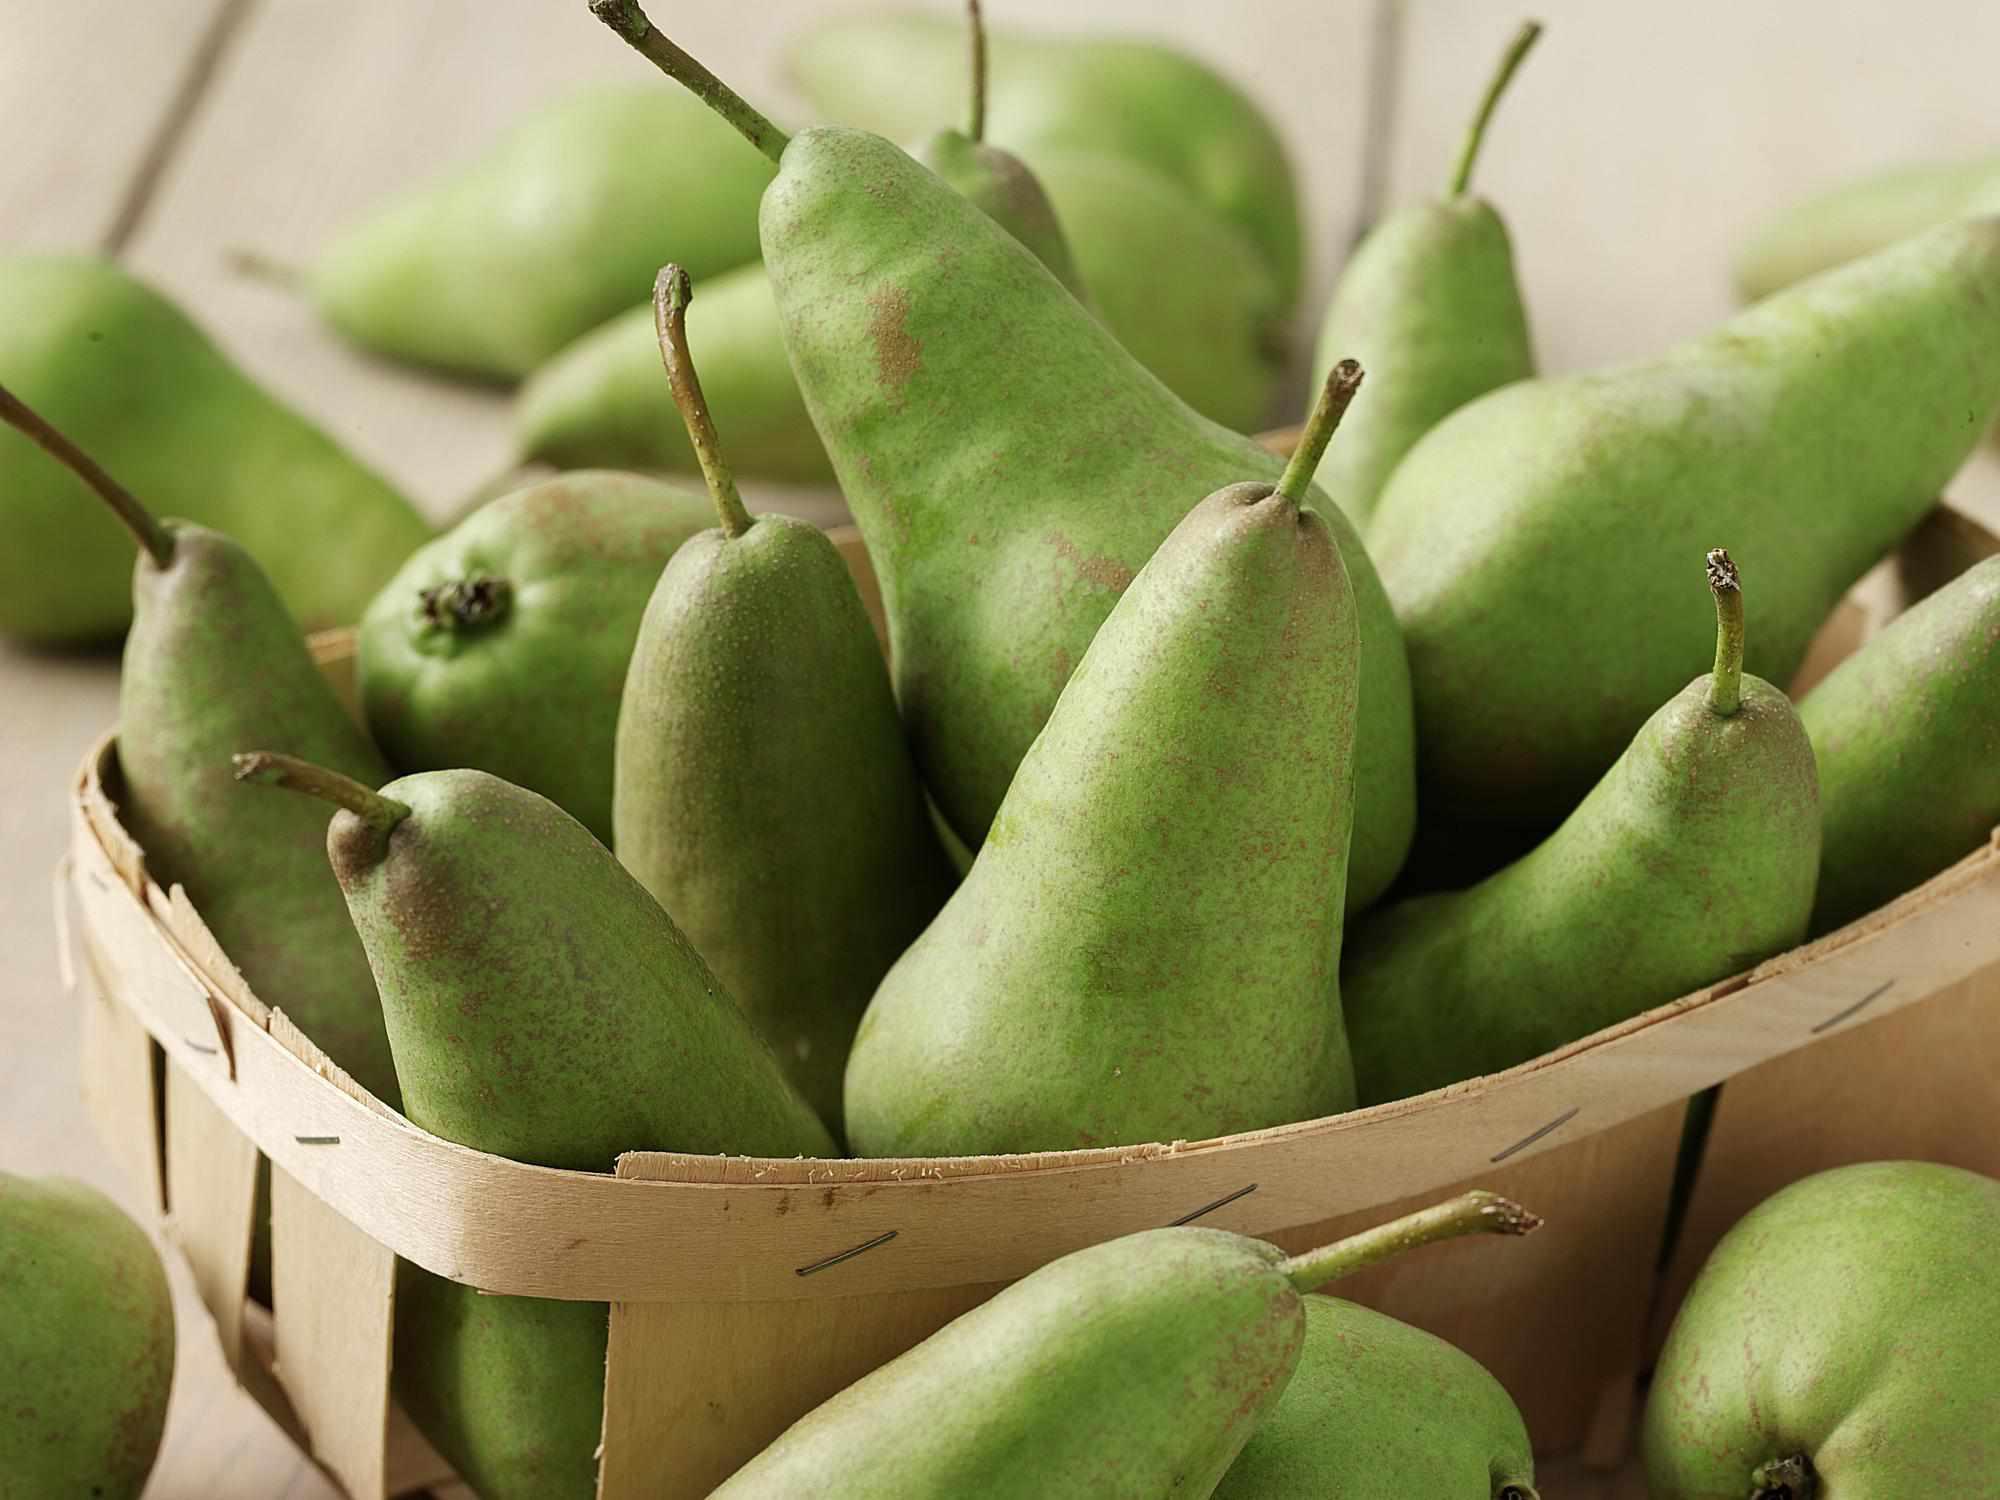 Basket of Green Pears